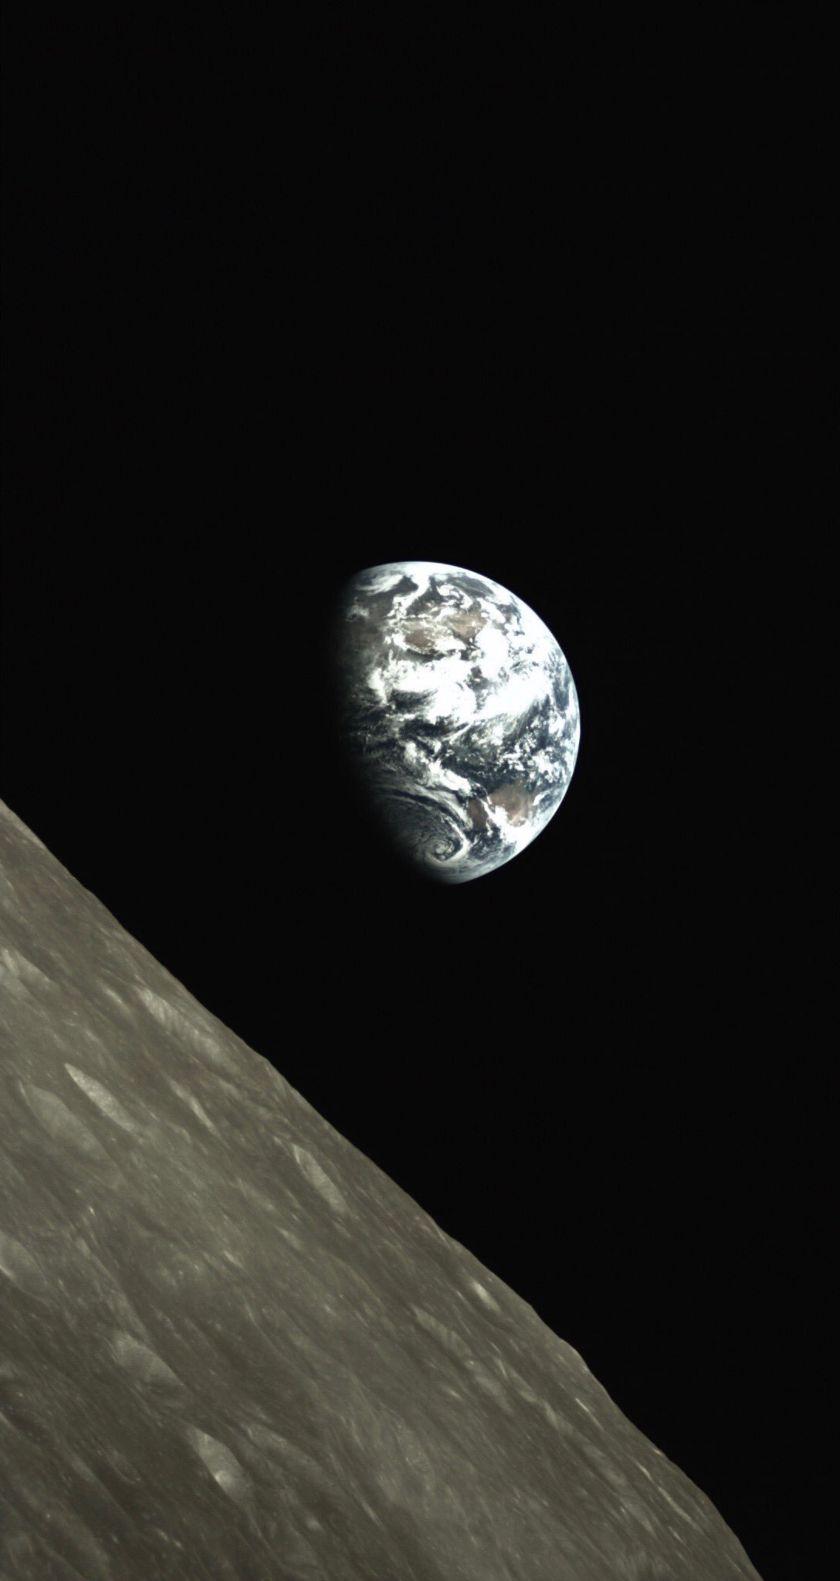 Earth and Moon from Longjiang-2